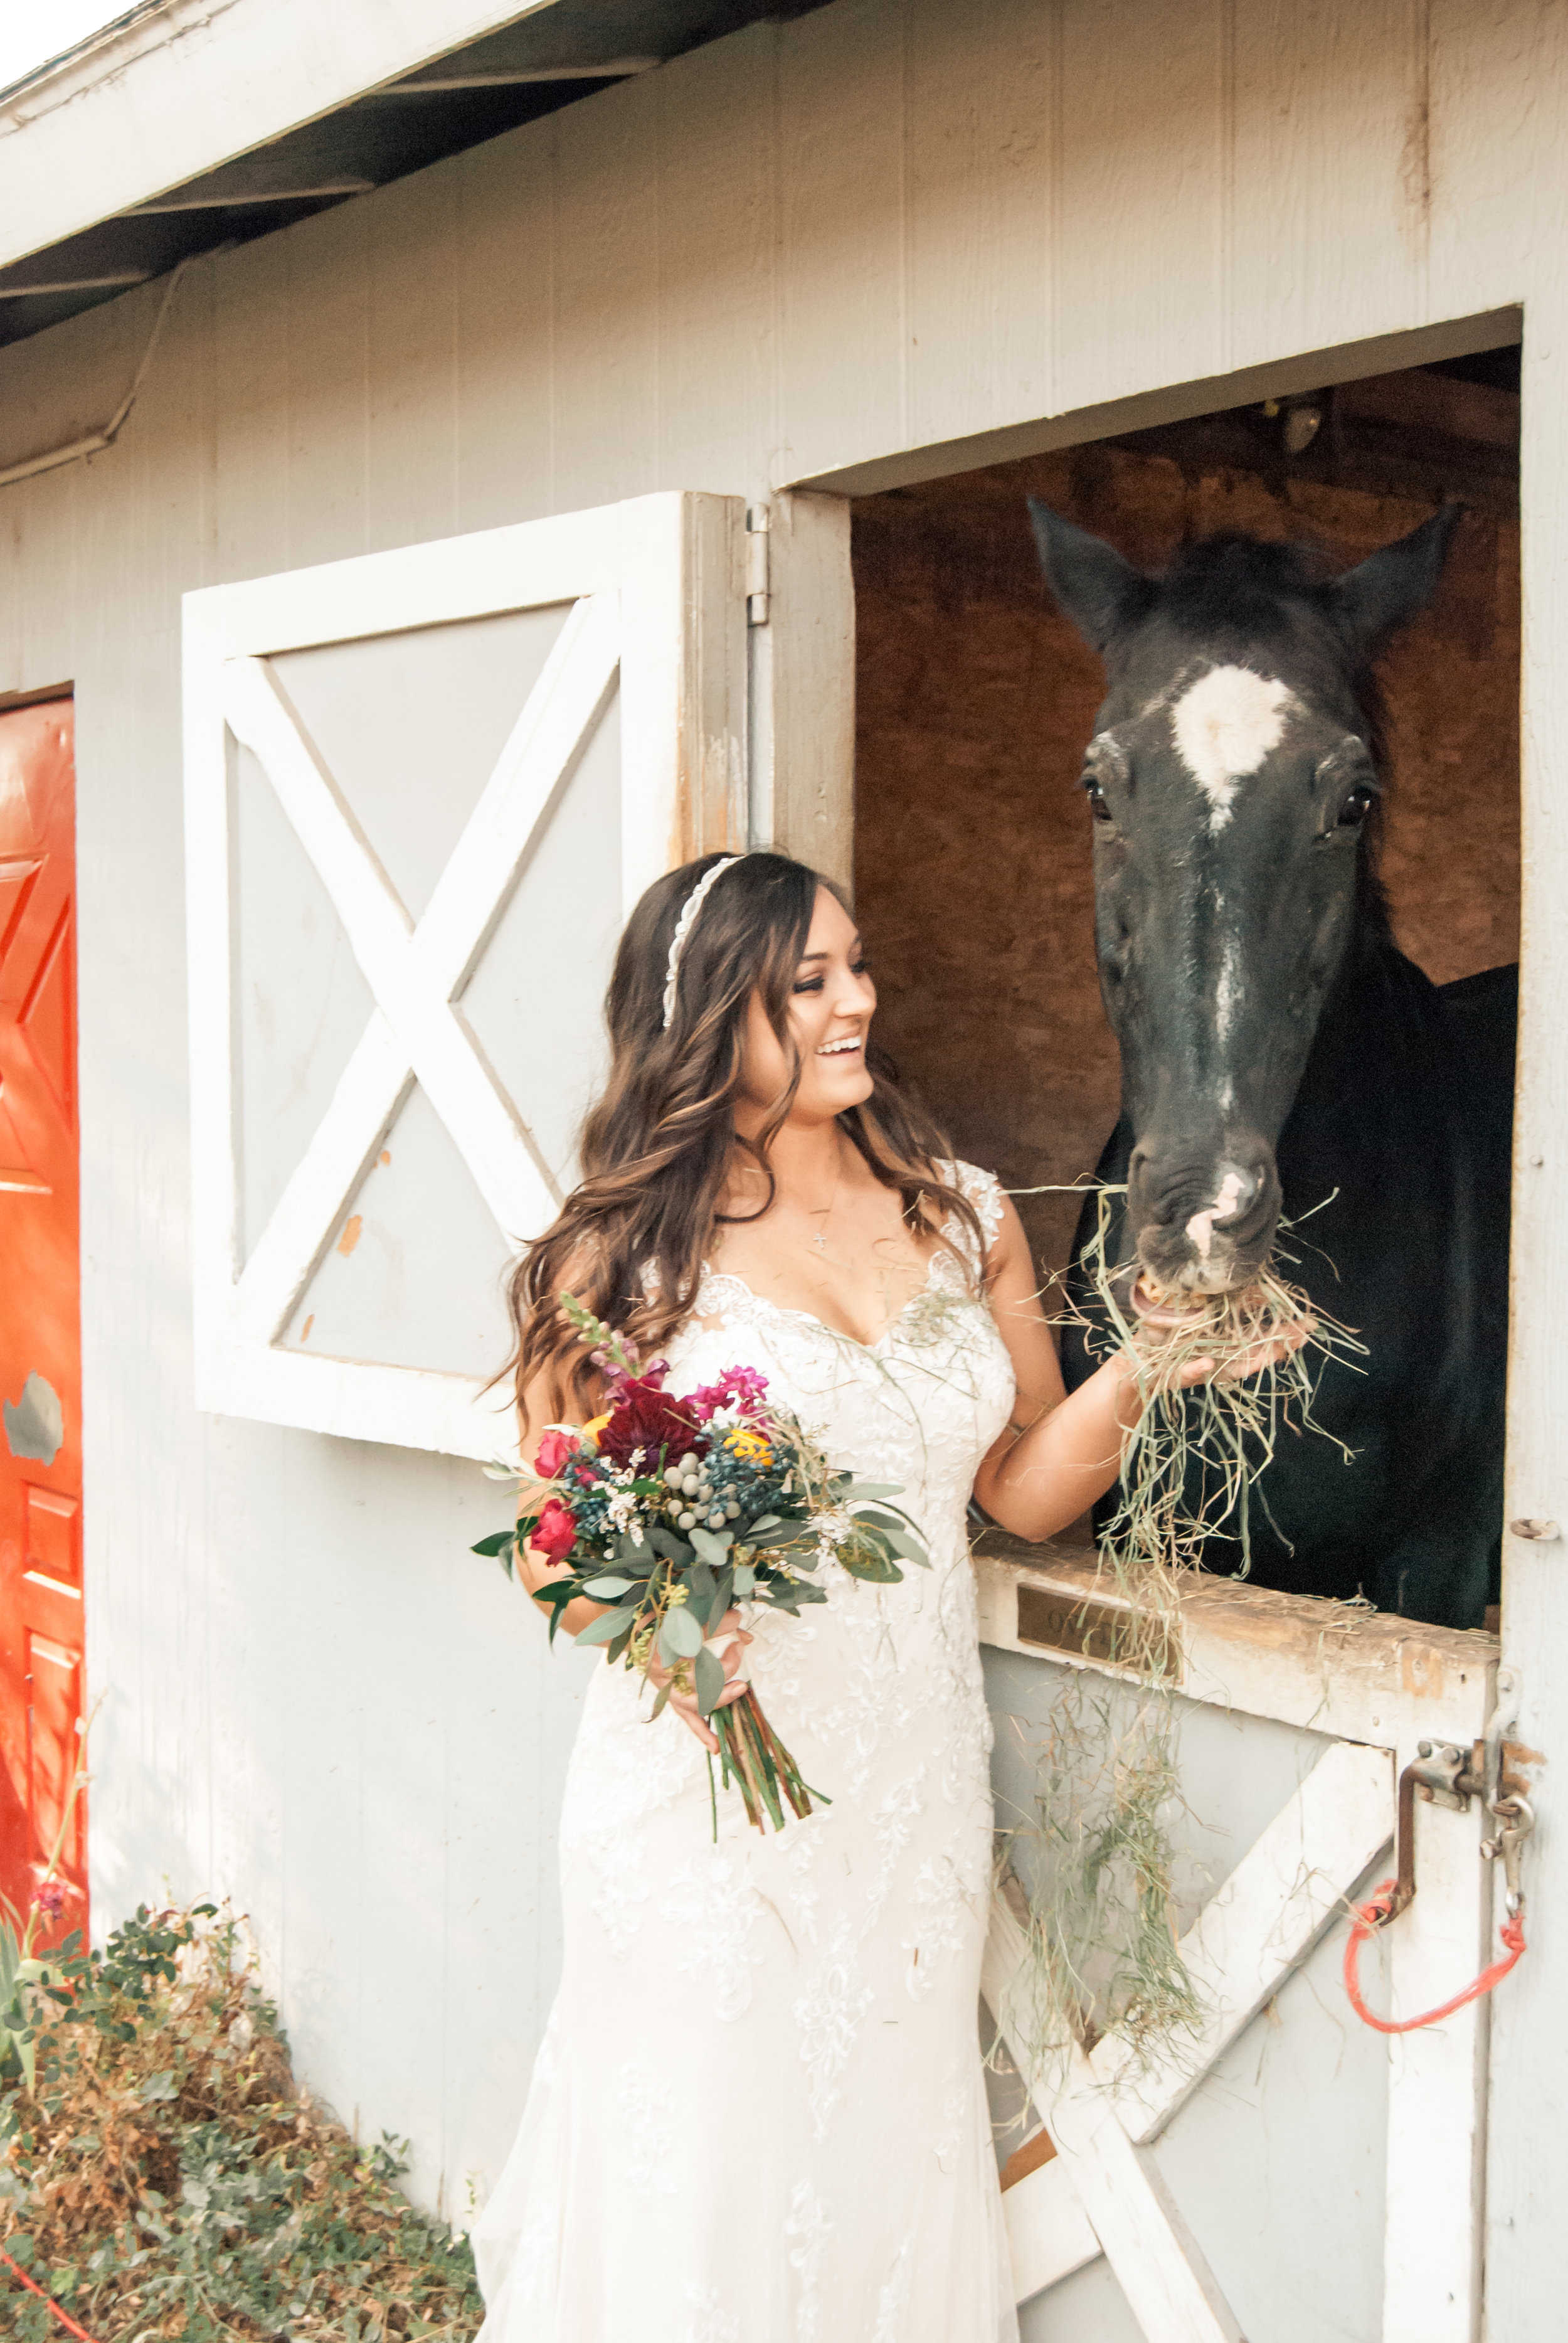 WeddingPortfolio-112.jpg